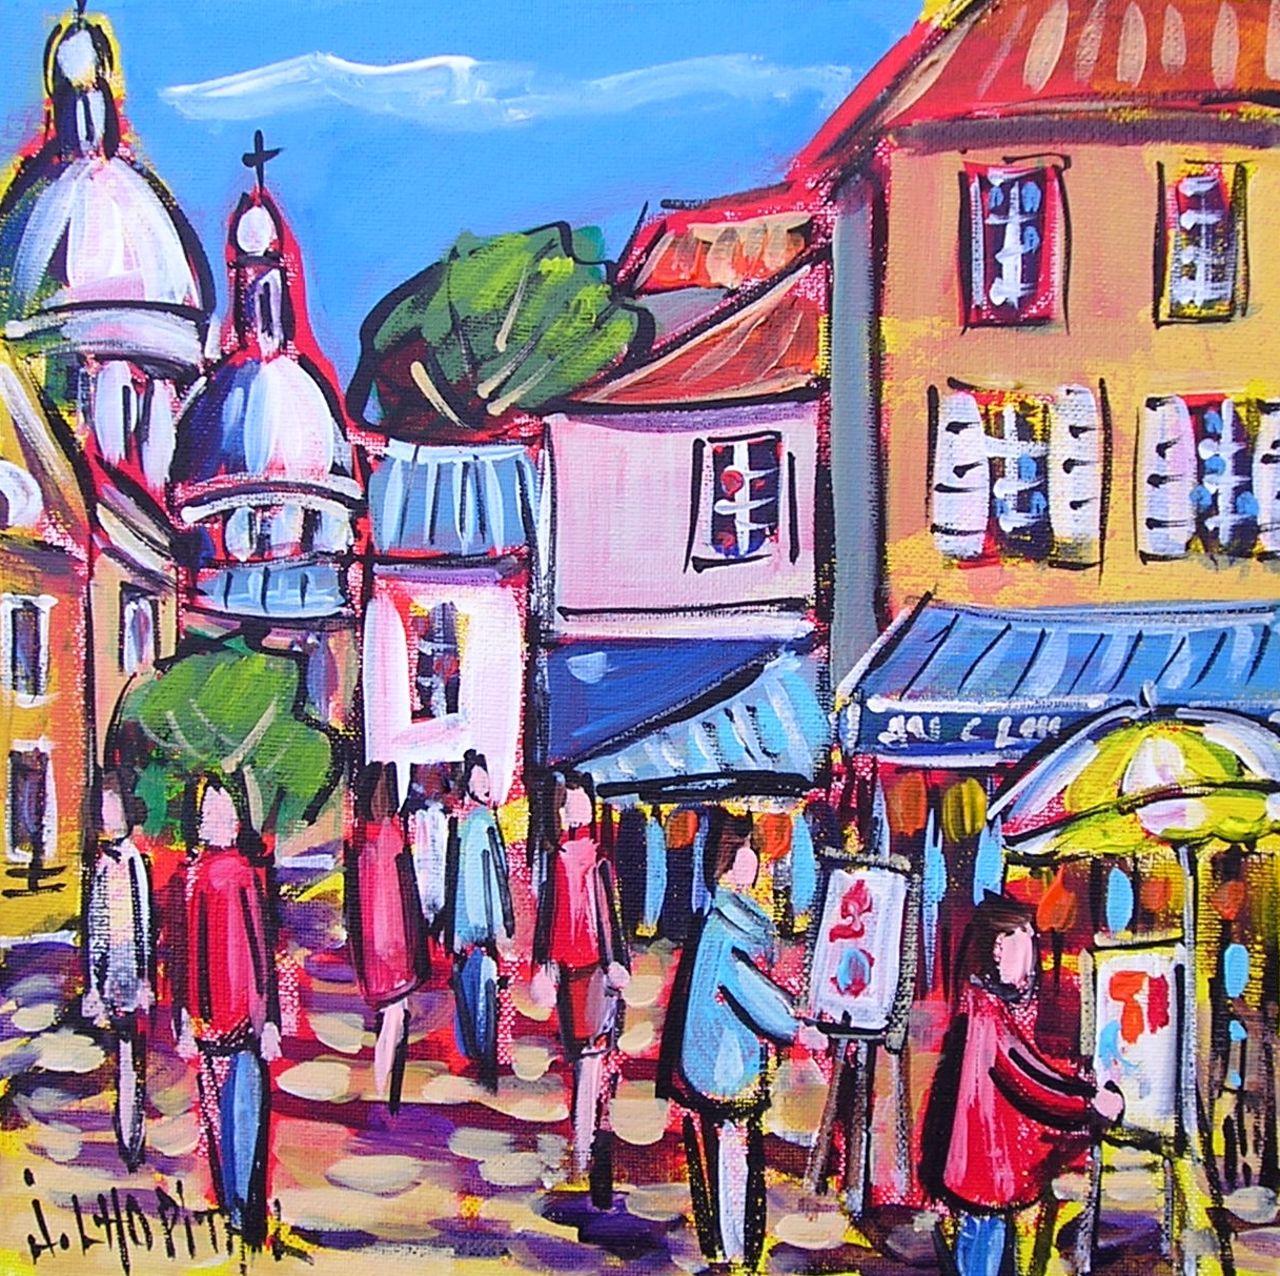 Joël Lhopital peintres à Montmartre